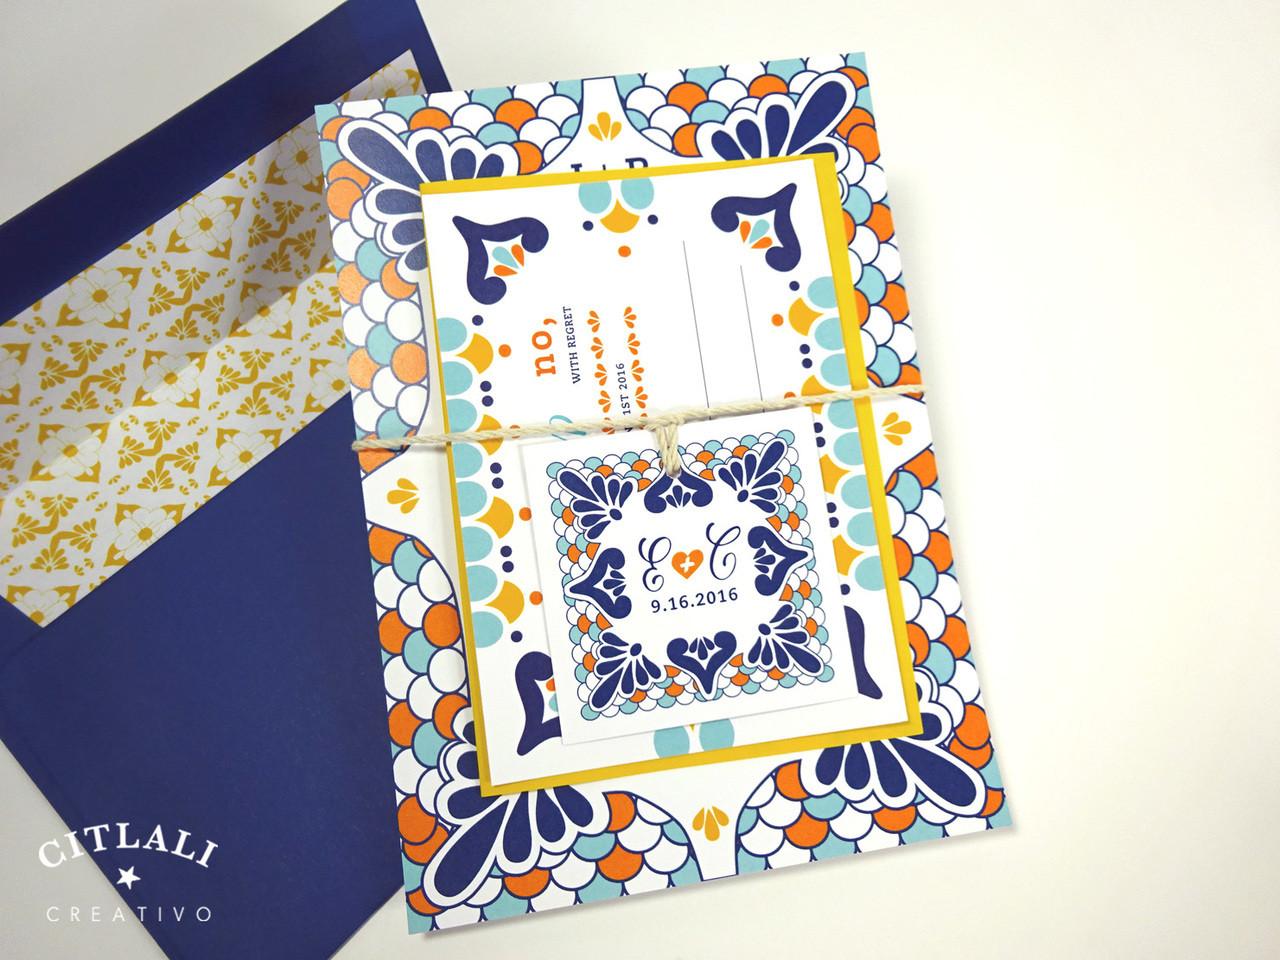 colorful talavera spanish tile wedding invitations spanish wedding invitations Talavera Spanish Tile Wedding Invitations